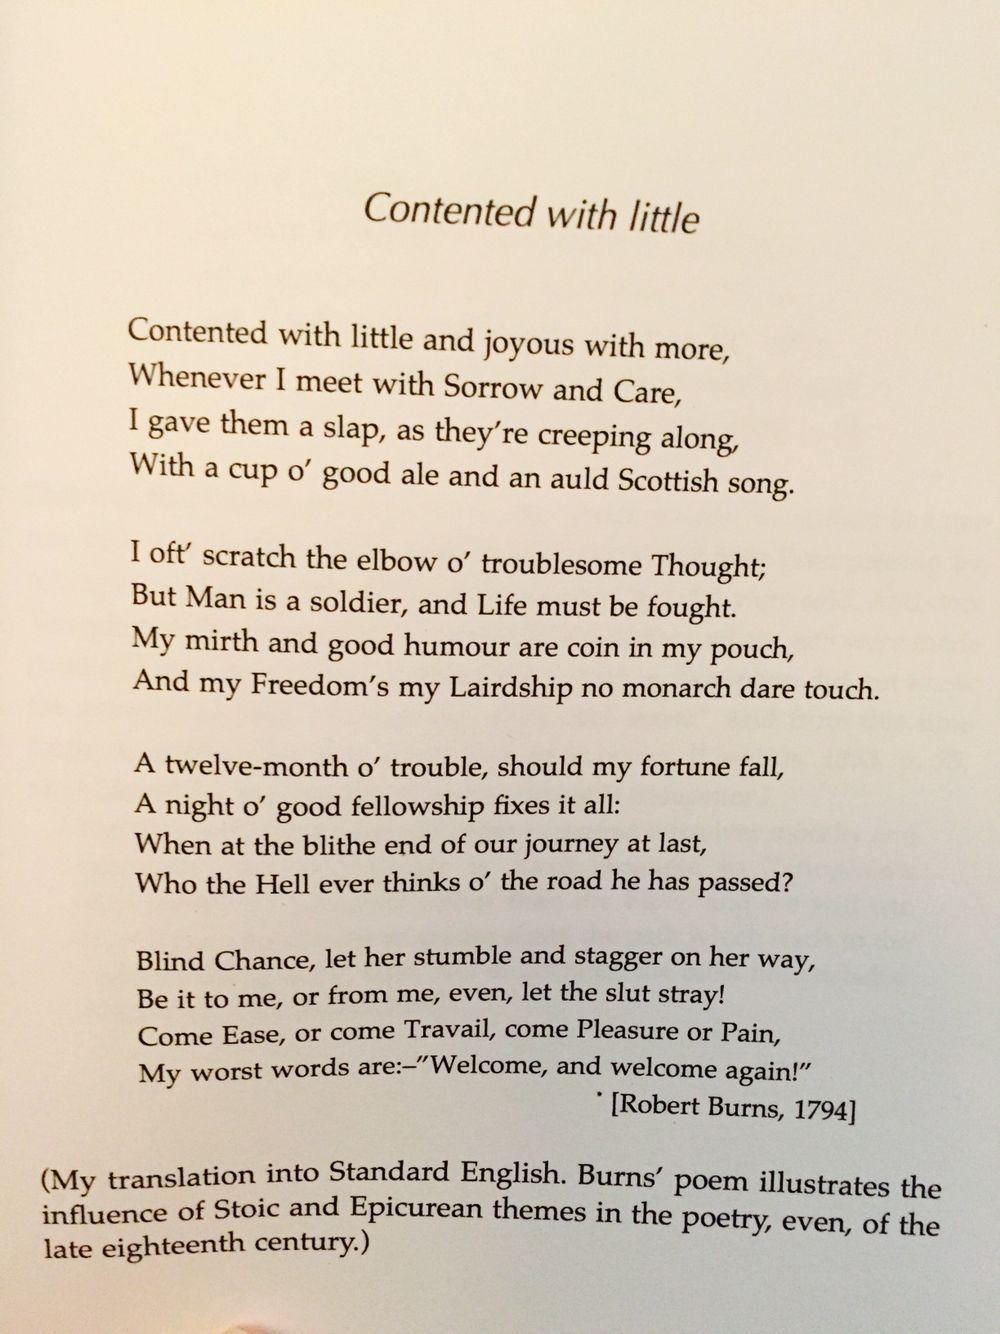 robert burns halloween poem translation